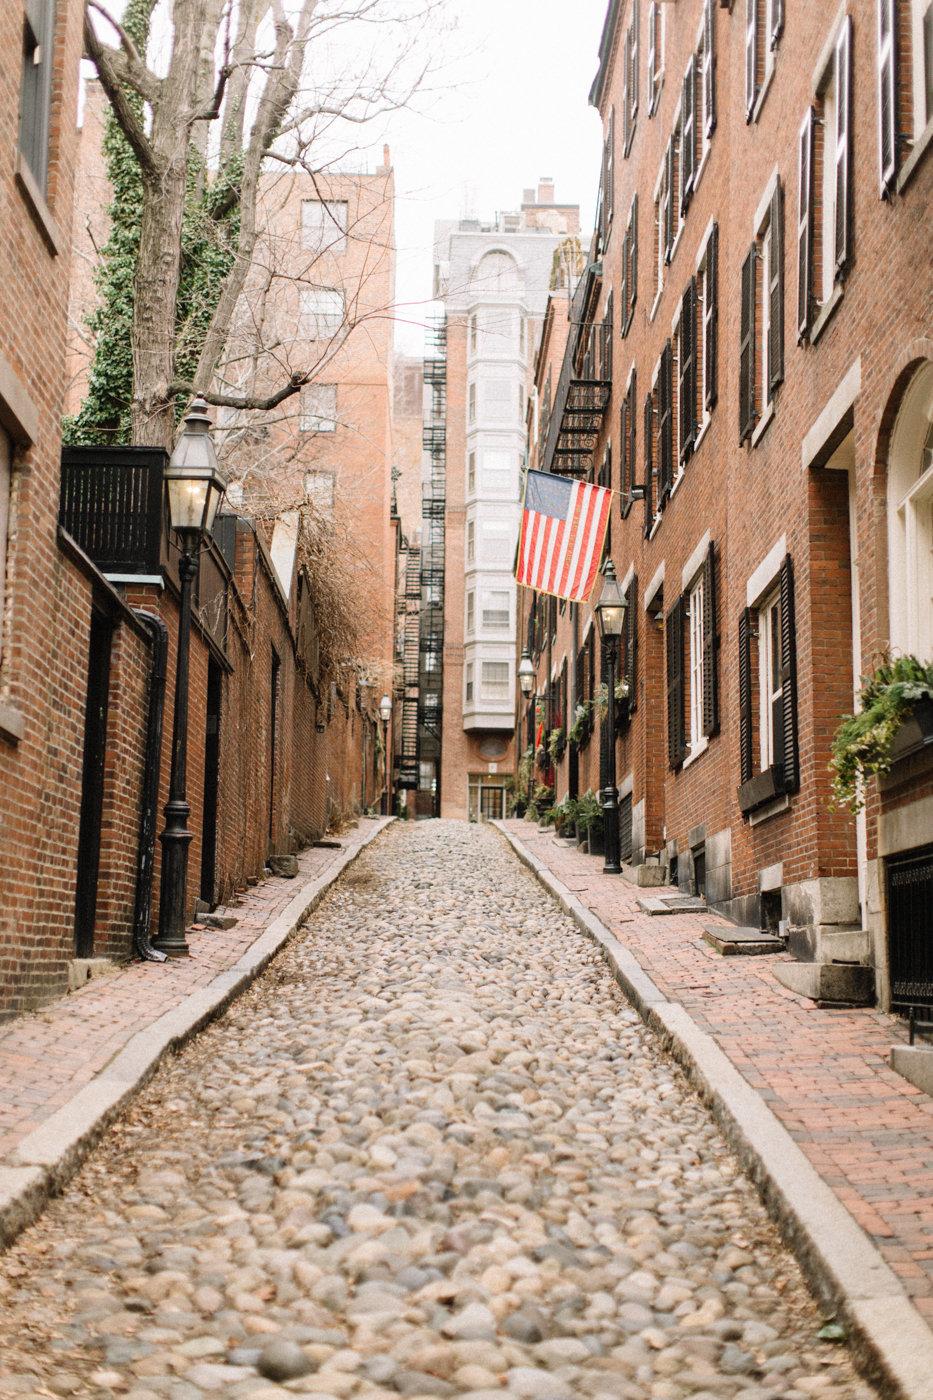 Boston Engagement Session | Four Corners Photography | Joy Wed blog | http://www.joy-wed.com